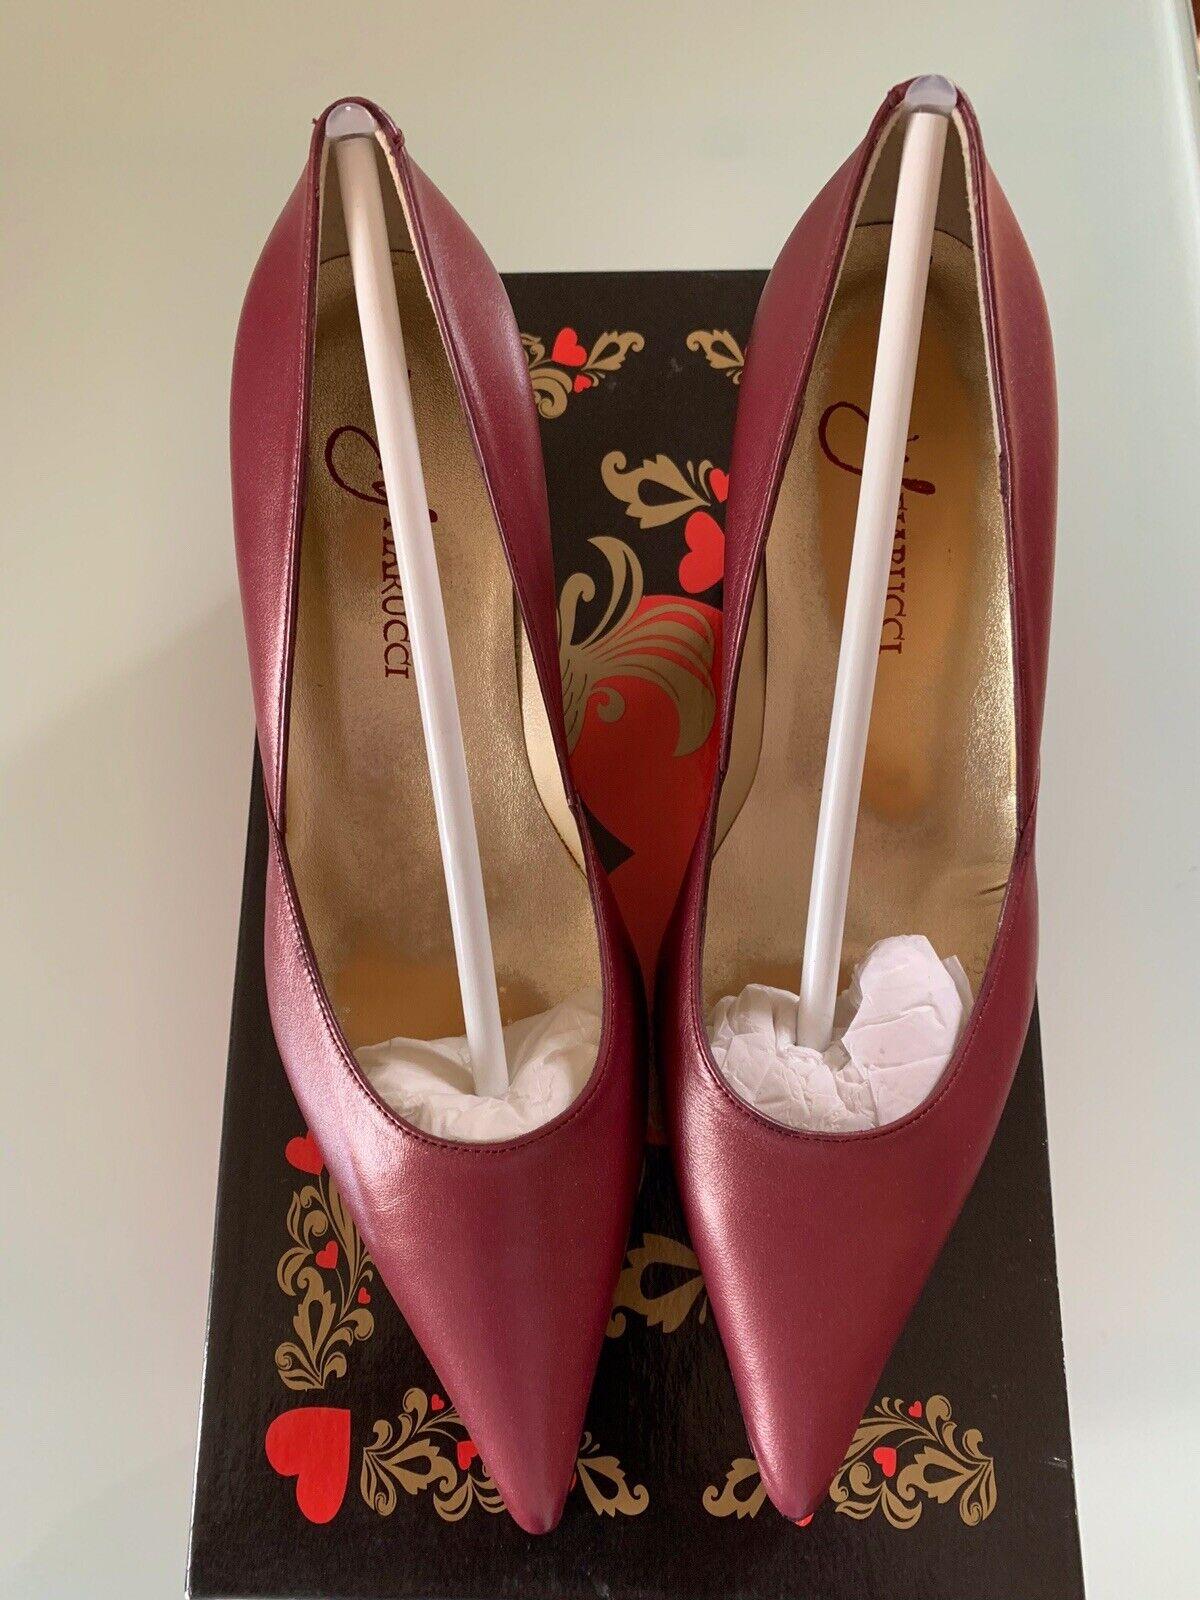 Nina Fiarucci Womens Shoes Size 36 NEW